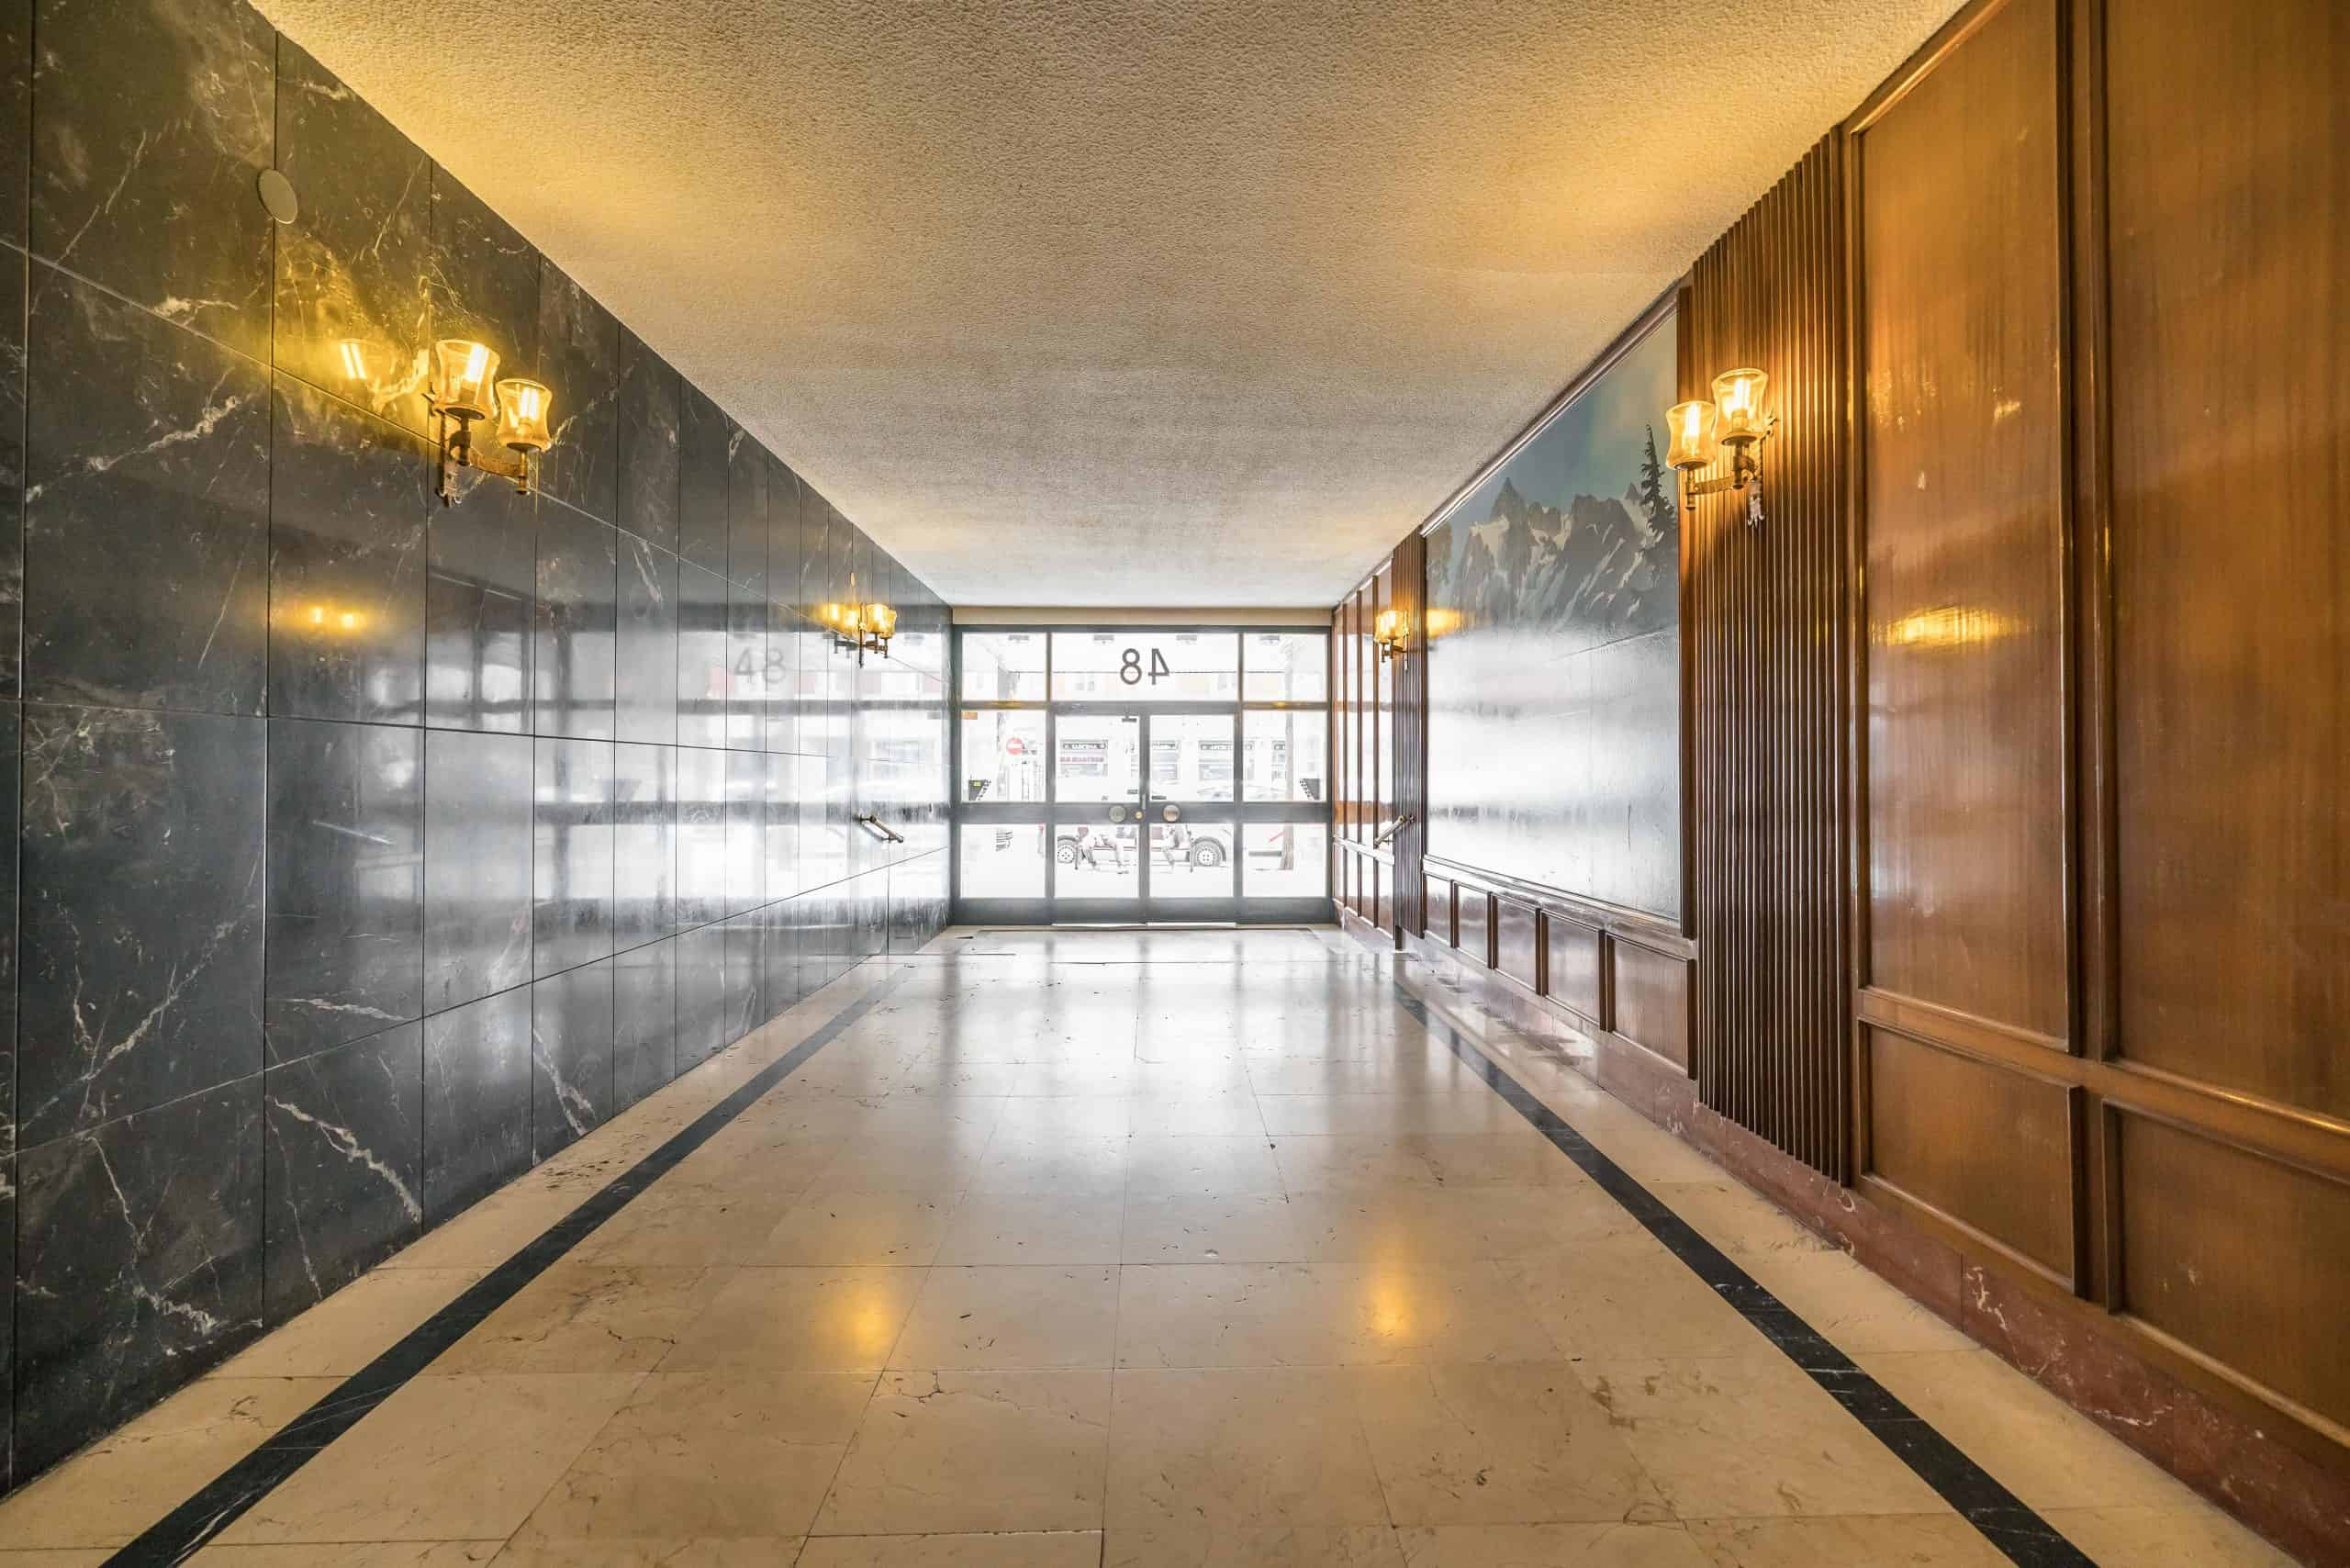 Agencia Inmobiliaria de Madrid-FUTUROCASA-Zona ARGANZUELA-LEGAZPI -calle Jaime Conquistador 48- Zonas Comunes 3